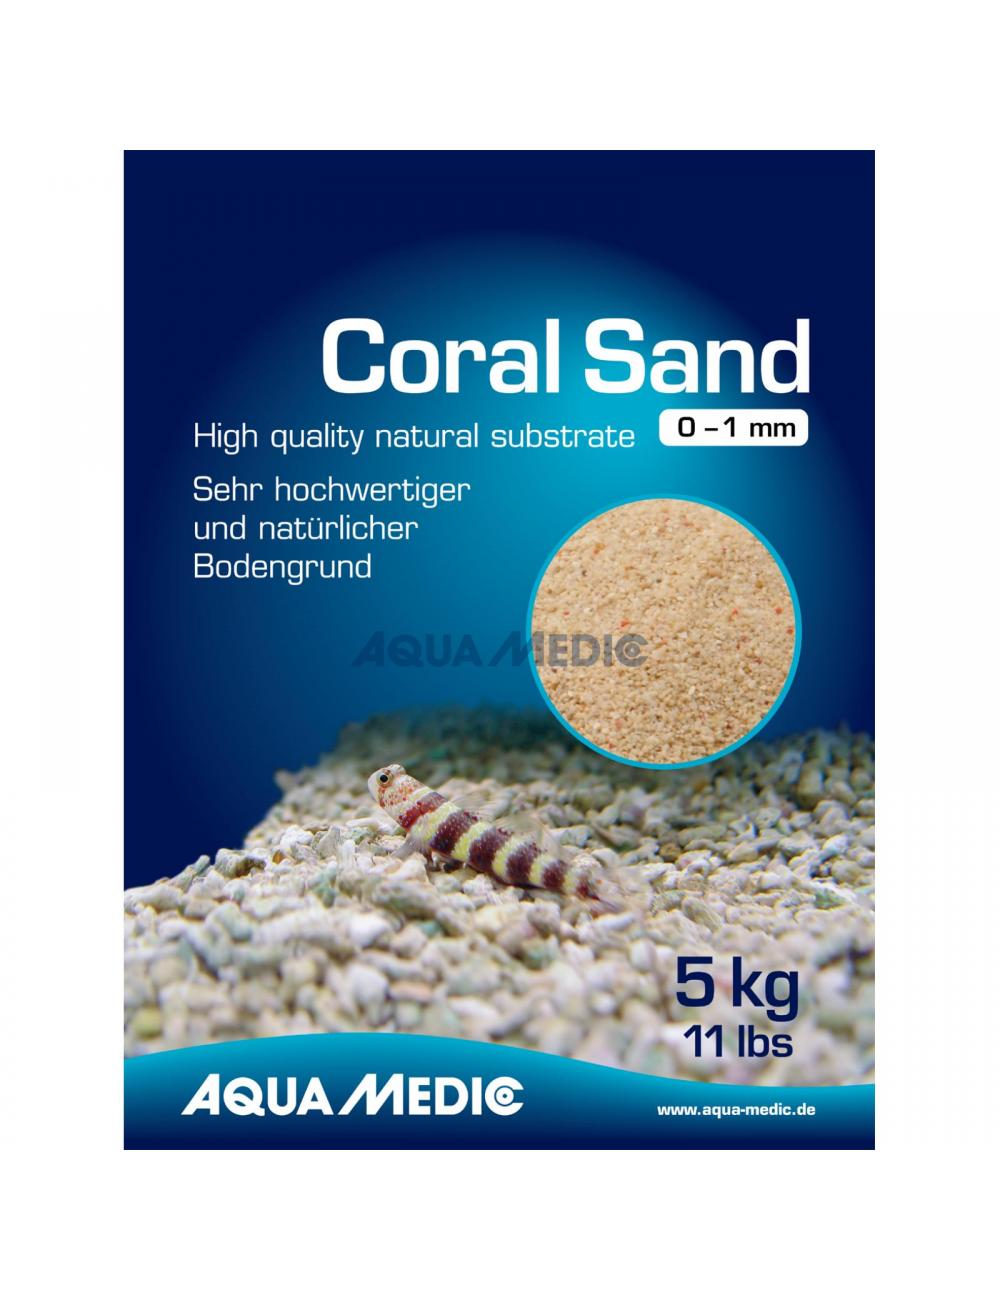 AQUA-MEDIC - Coral Sand - 2 - 5 mm - 5 kg sac